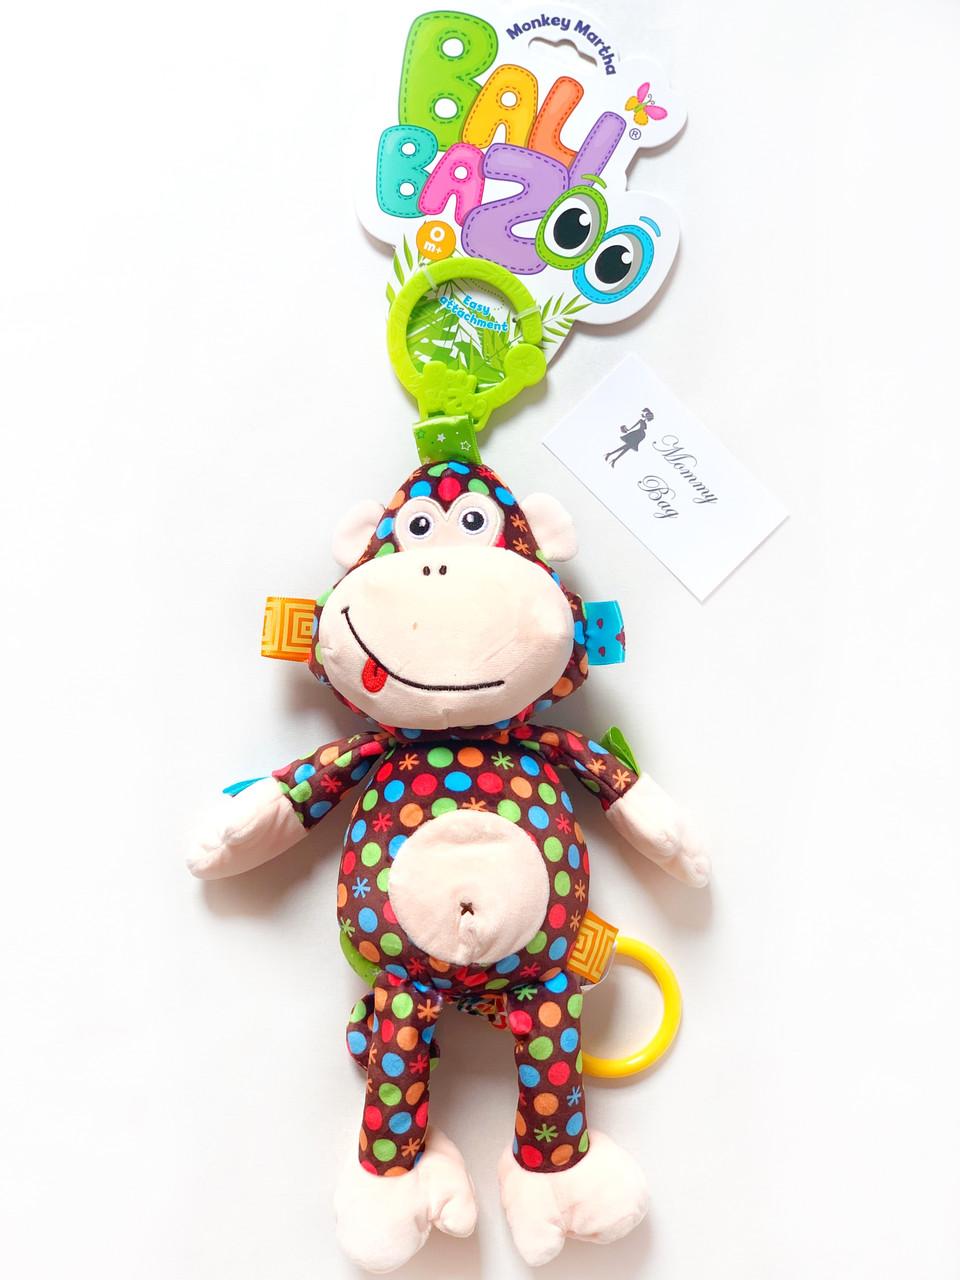 Музыкальная игрушка Обезьянка Марта (35 см) Balibazoo